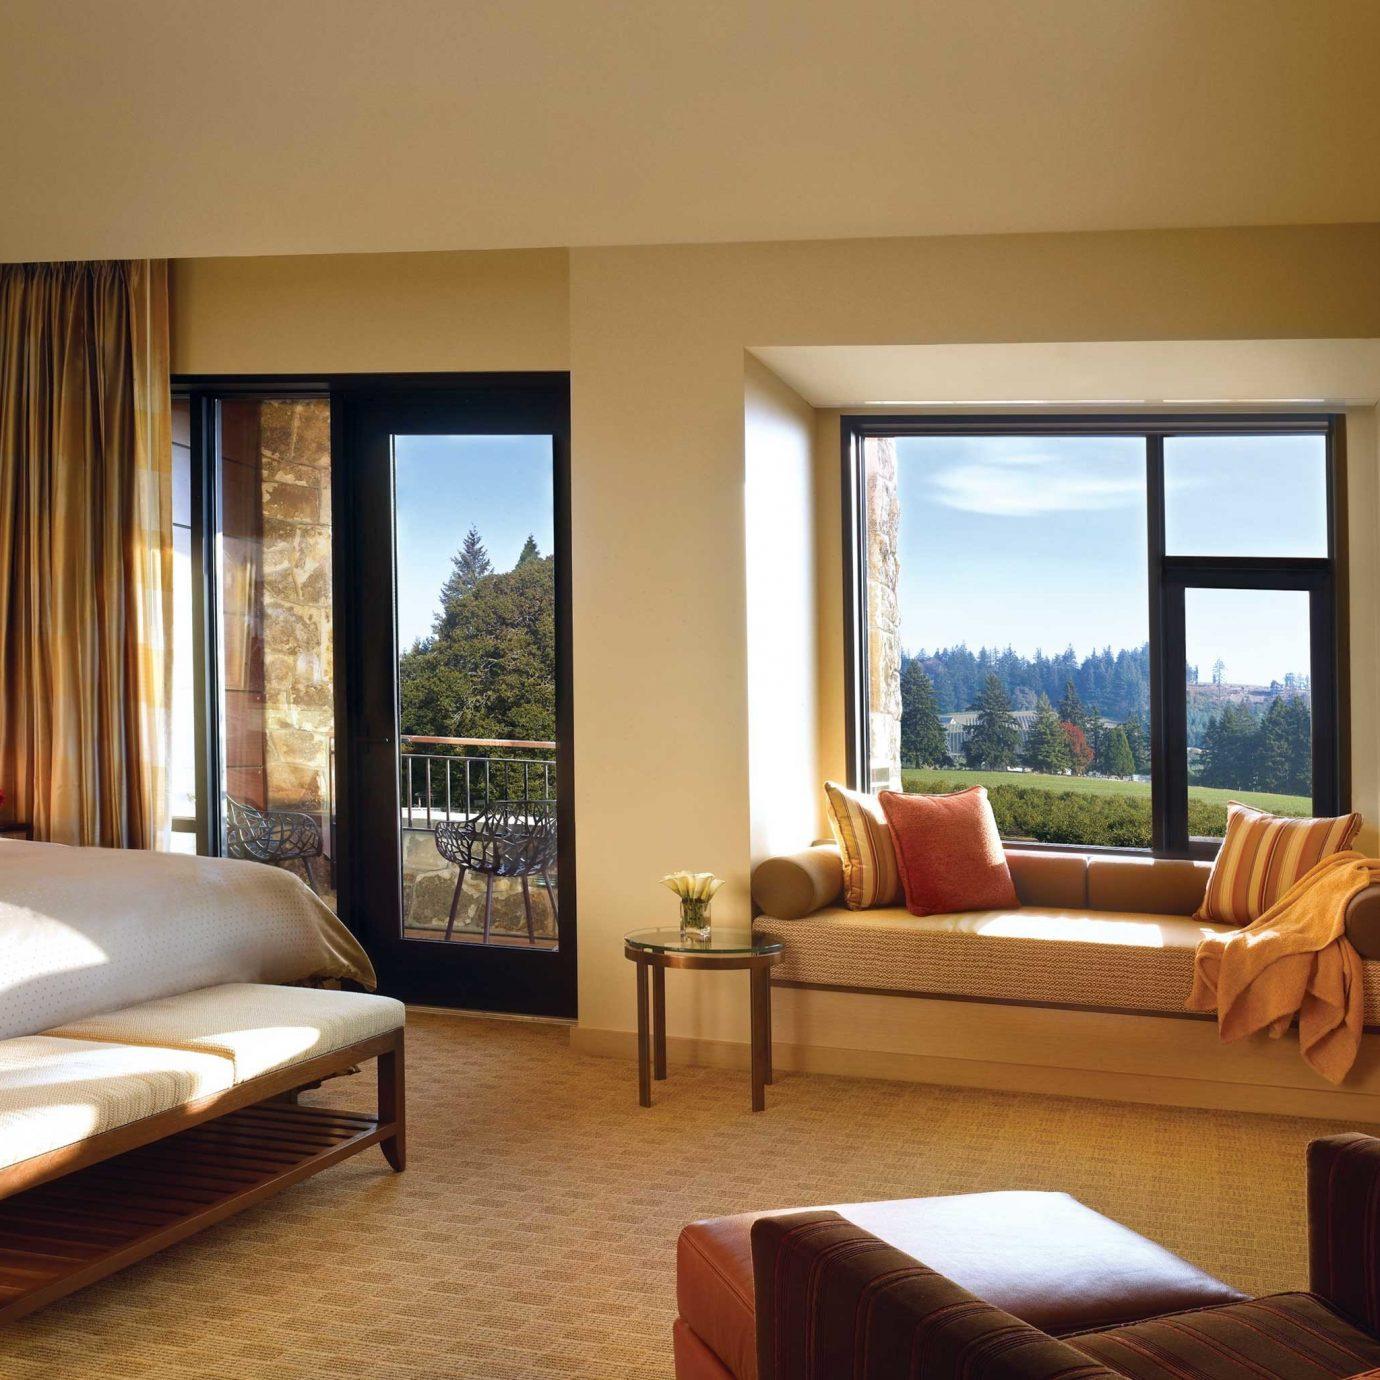 Bedroom Food + Drink Hotels Luxury Modern Scenic views Suite sofa property living room Villa Resort home condominium cottage